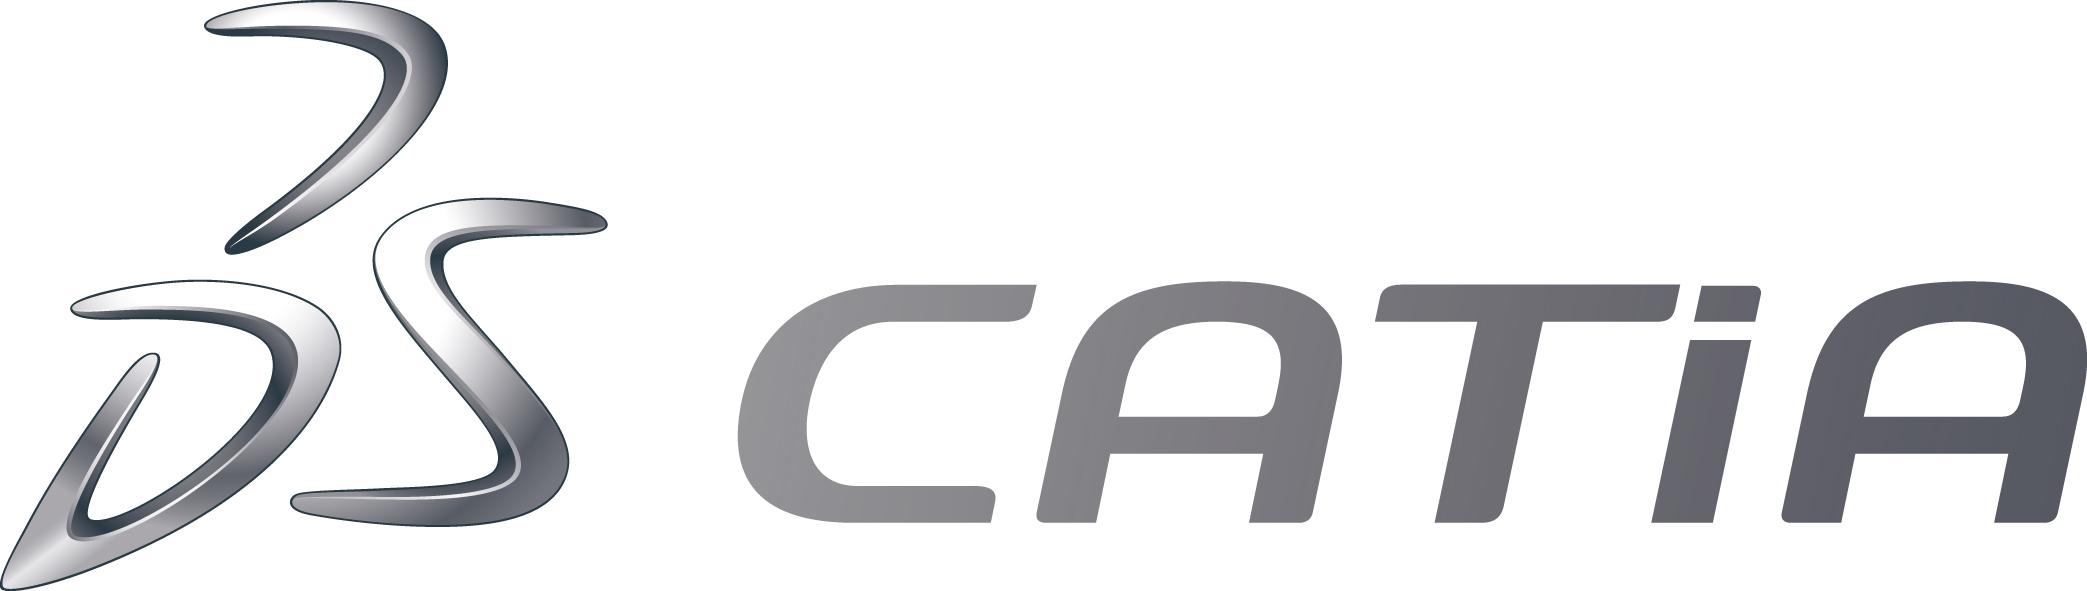 CATIA Rendering